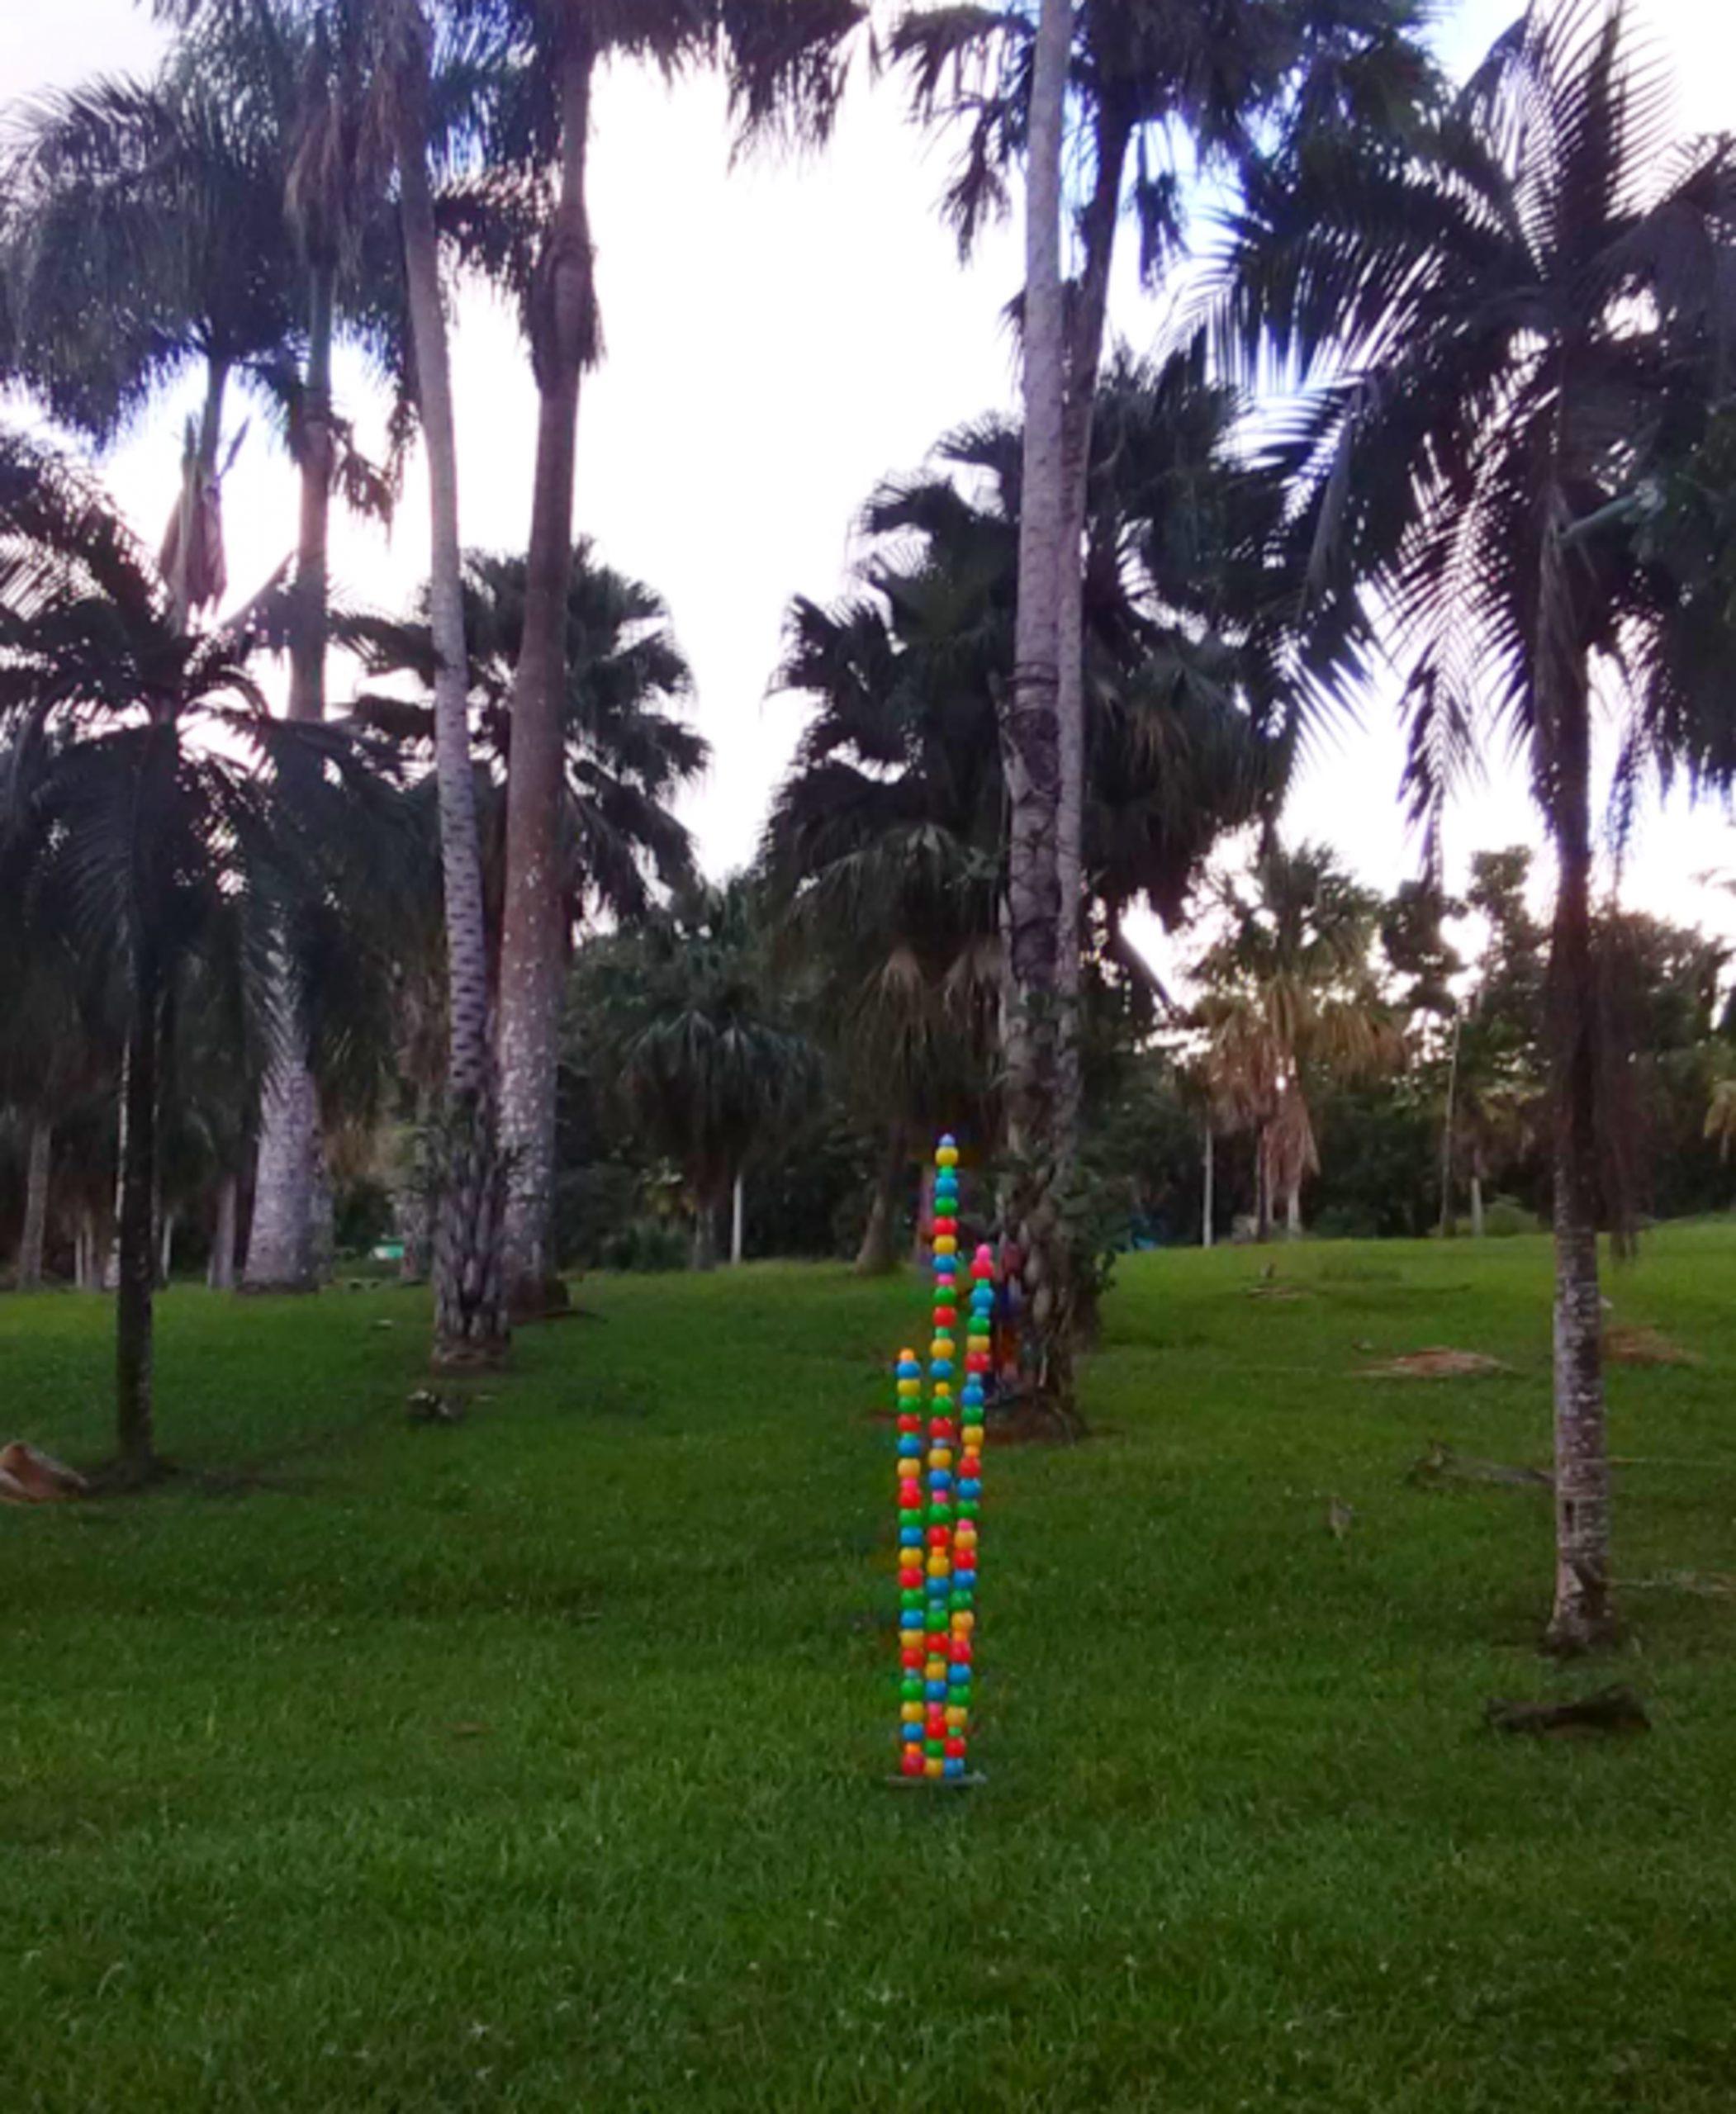 Minimalist Bamboos